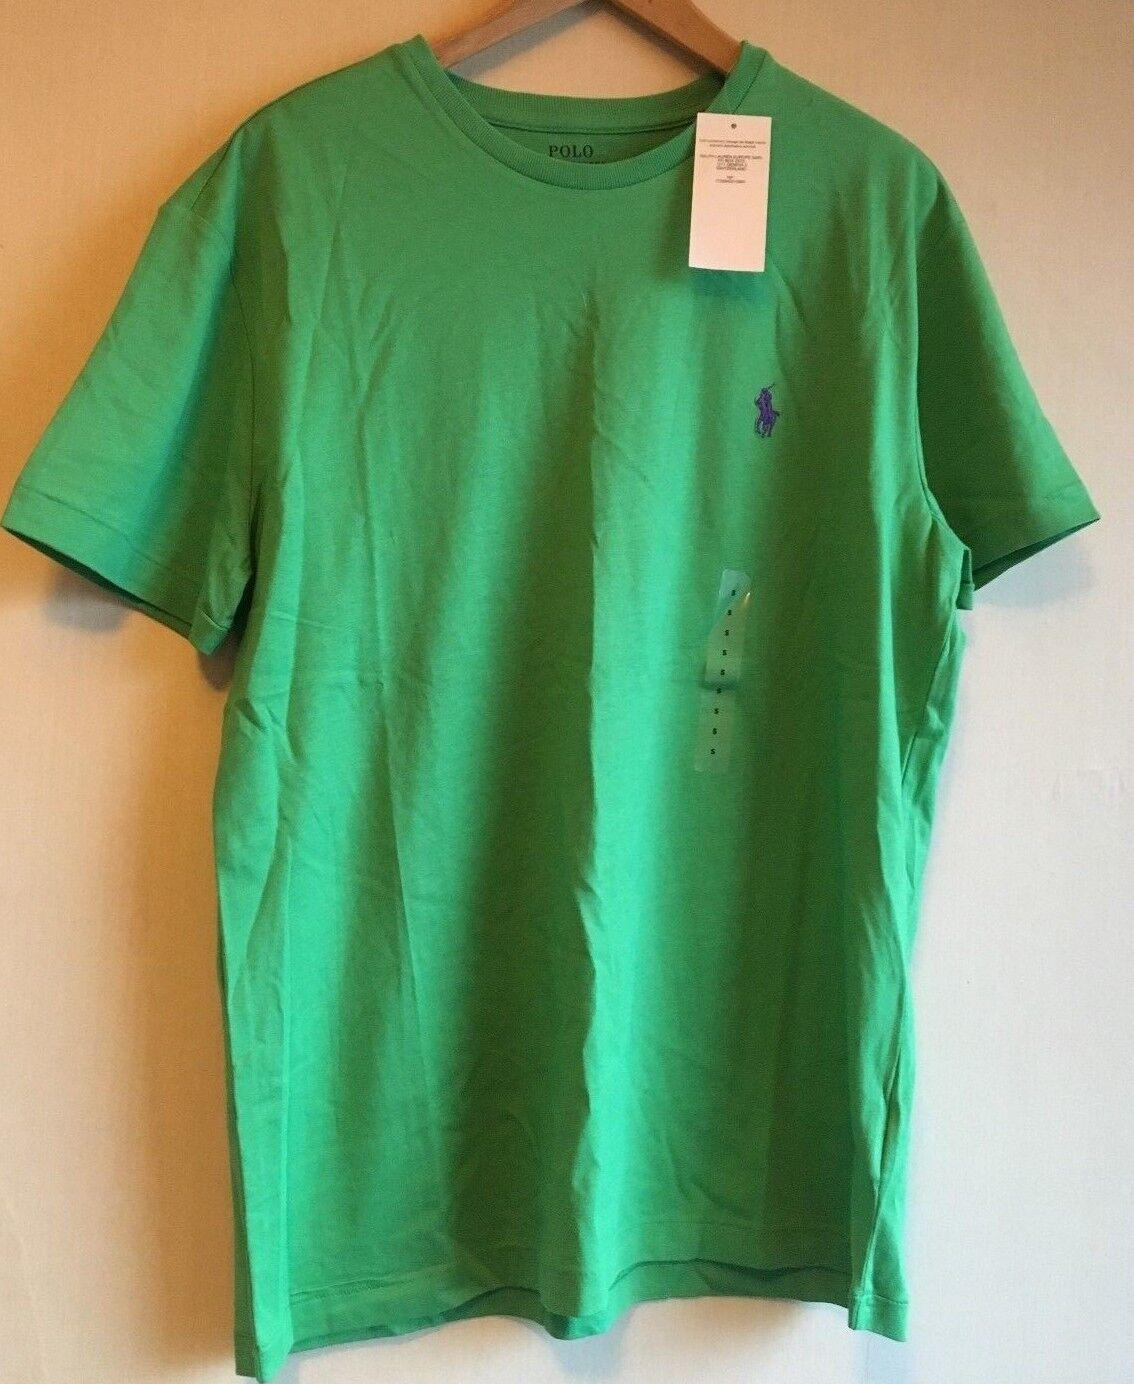 2bf16fe0ca80 BNWT New Ralph Lauren Polo Standard Short Sleeve T-Shirt - - Small Green  Size nnmpsc3972-T-Shirts